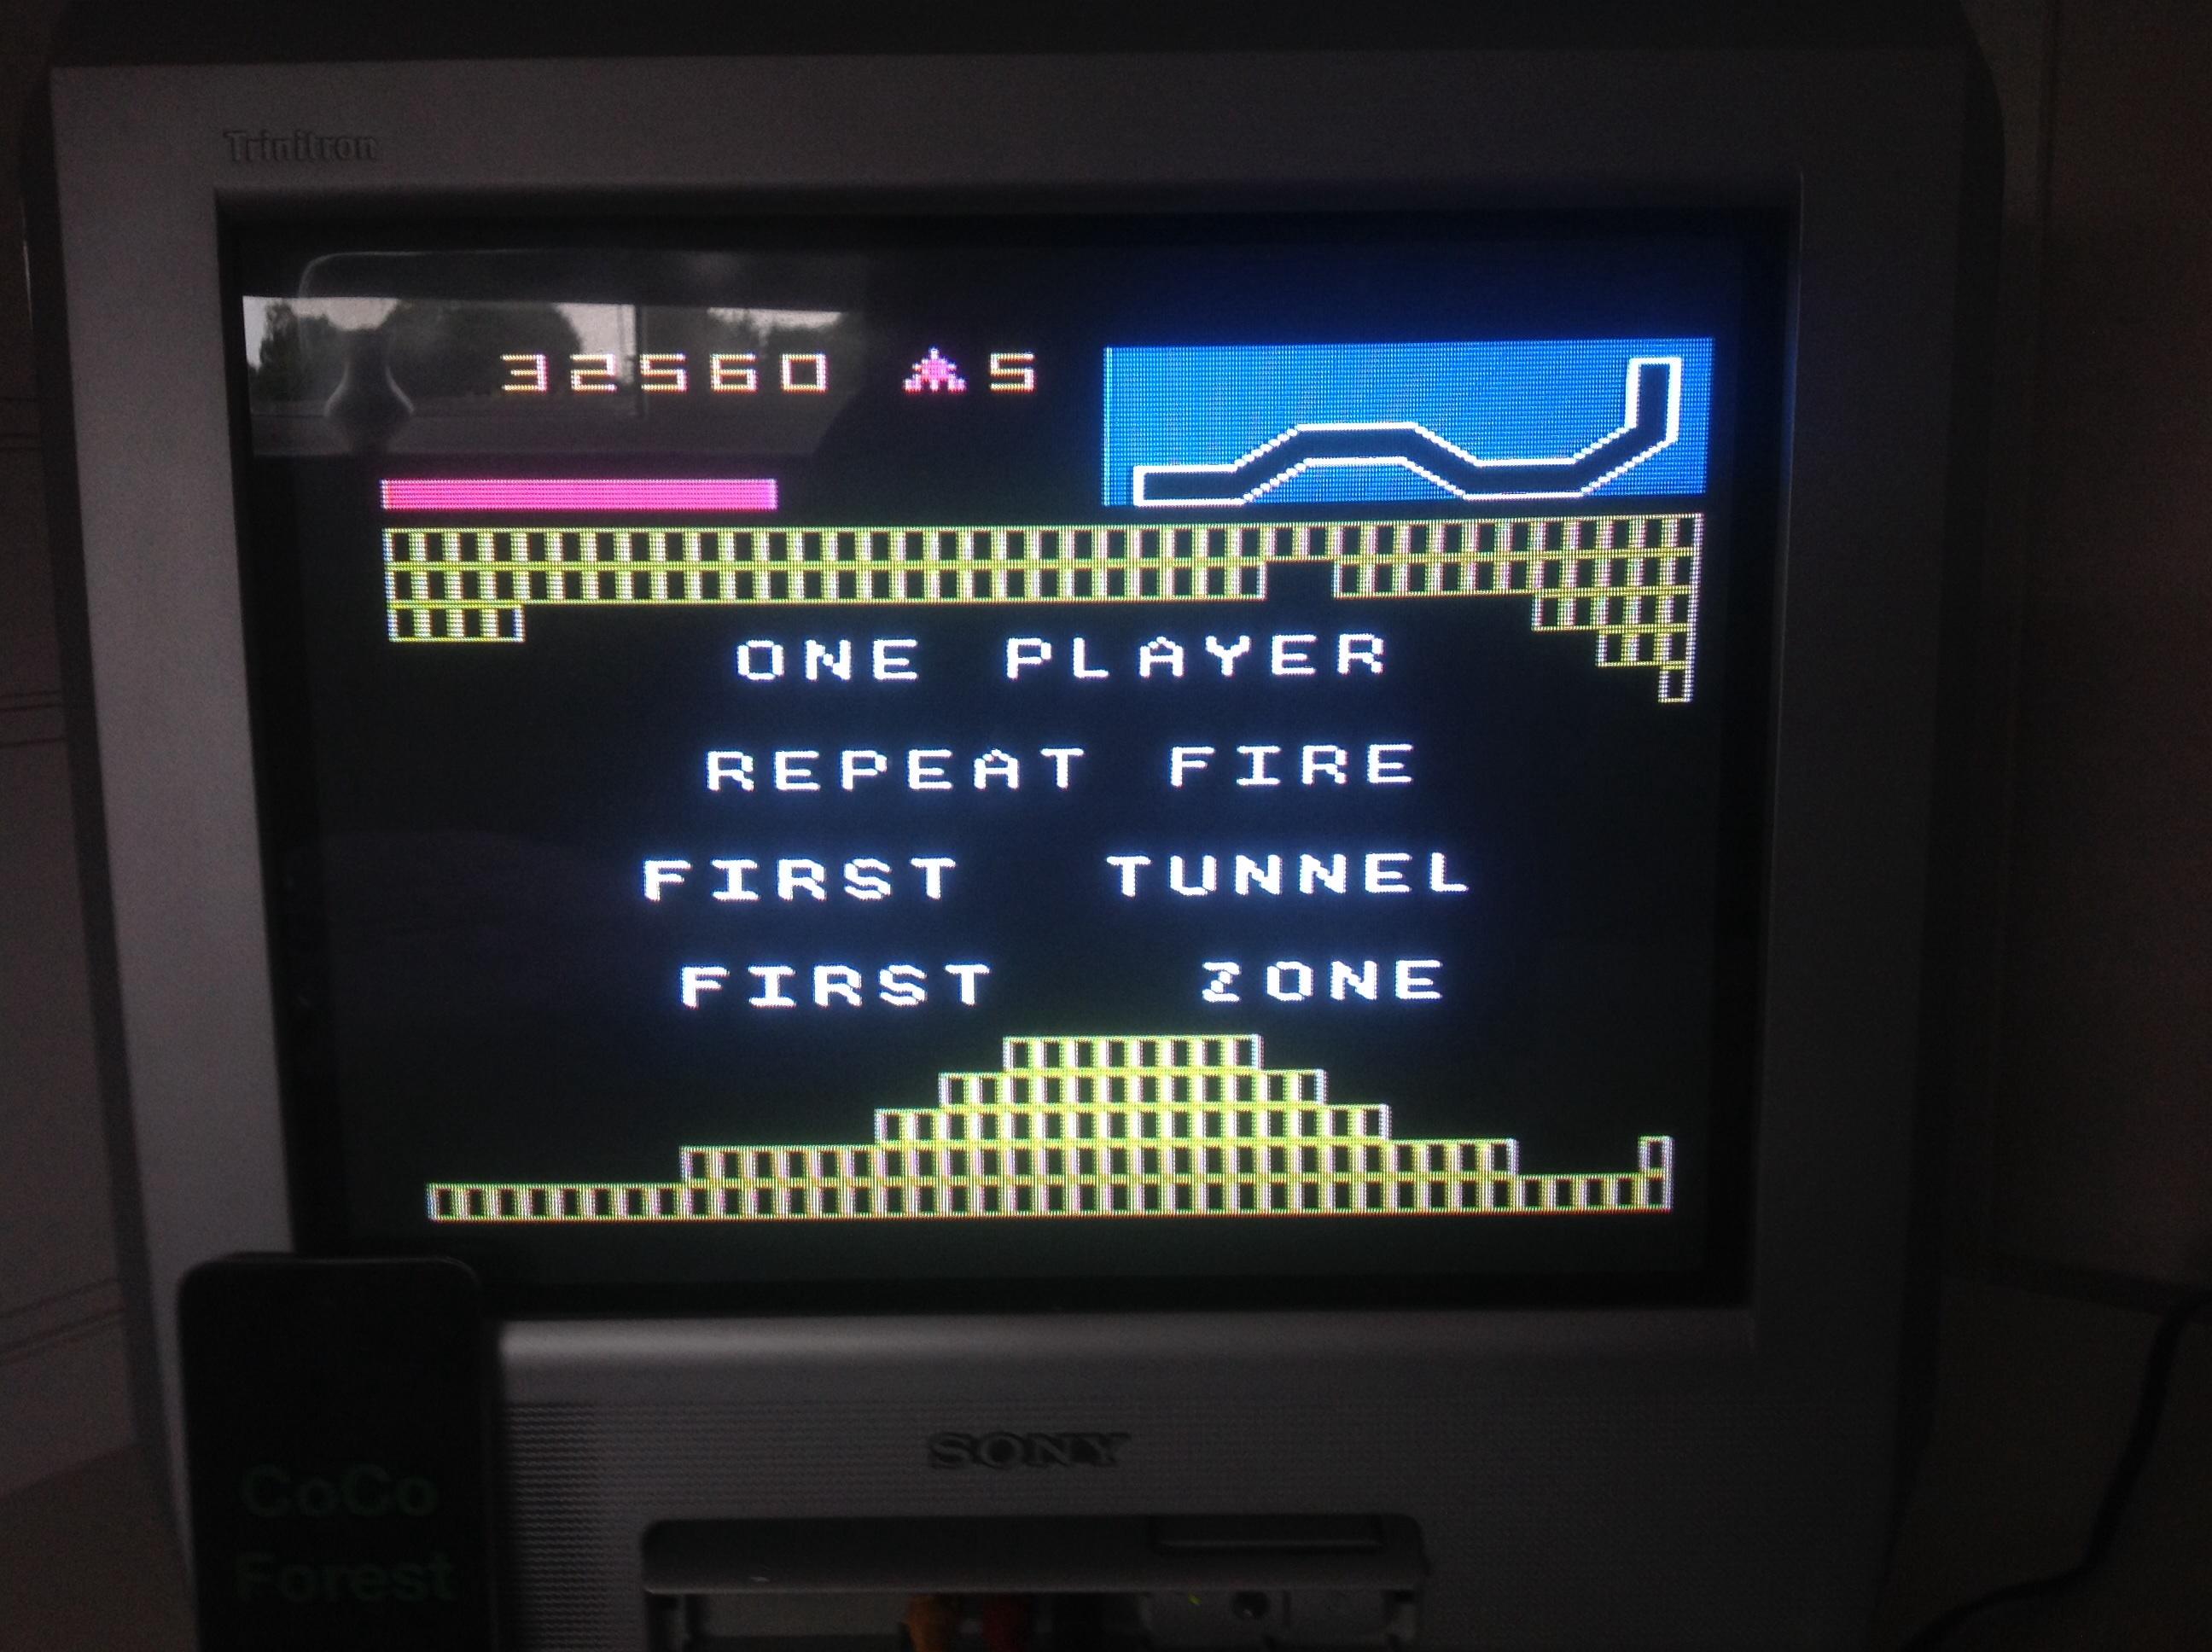 CoCoForest: Vanguard (Atari 5200) 32,560 points on 2014-09-01 09:41:00